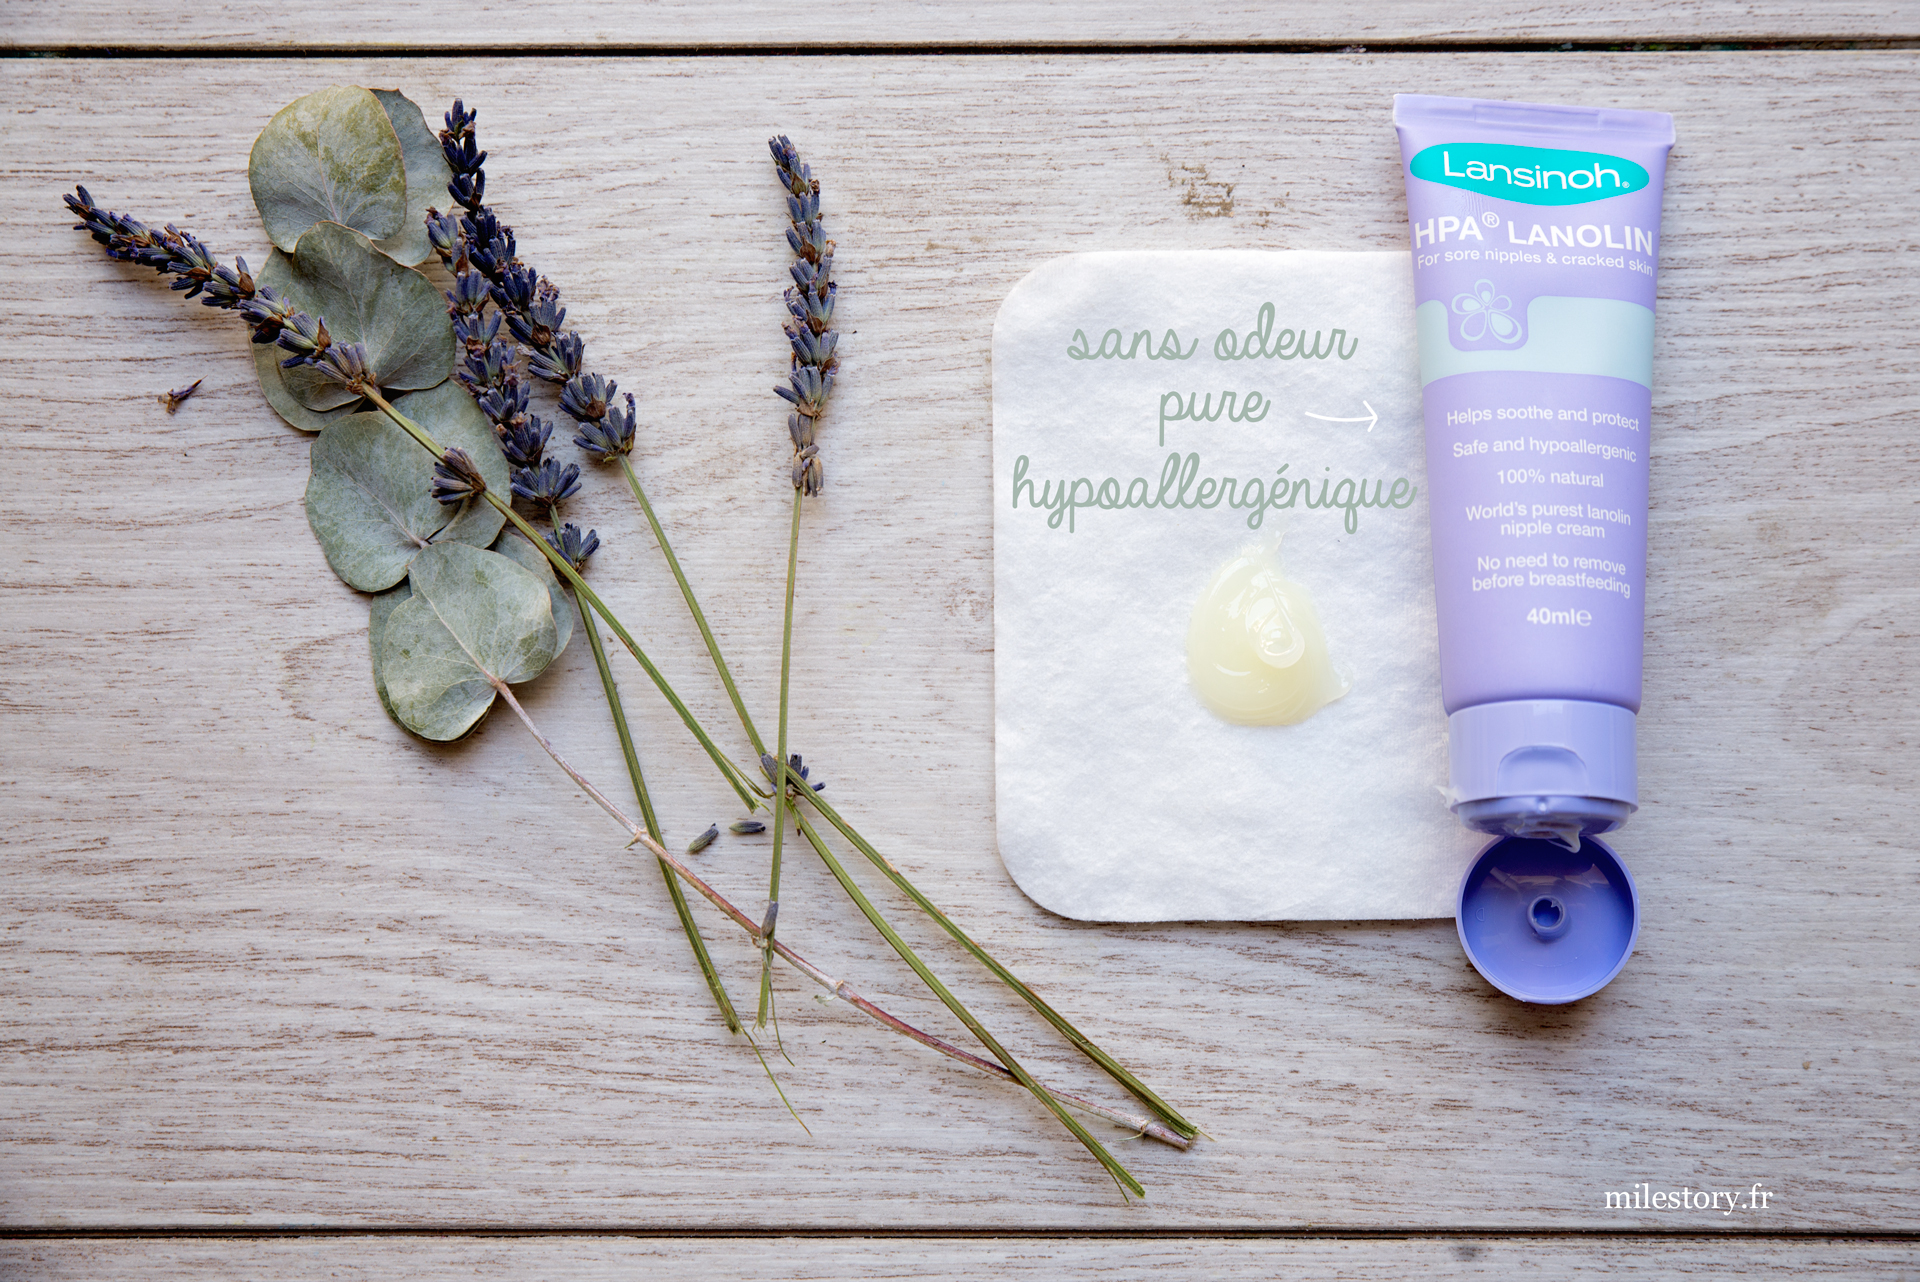 crème lanoline lansinoh